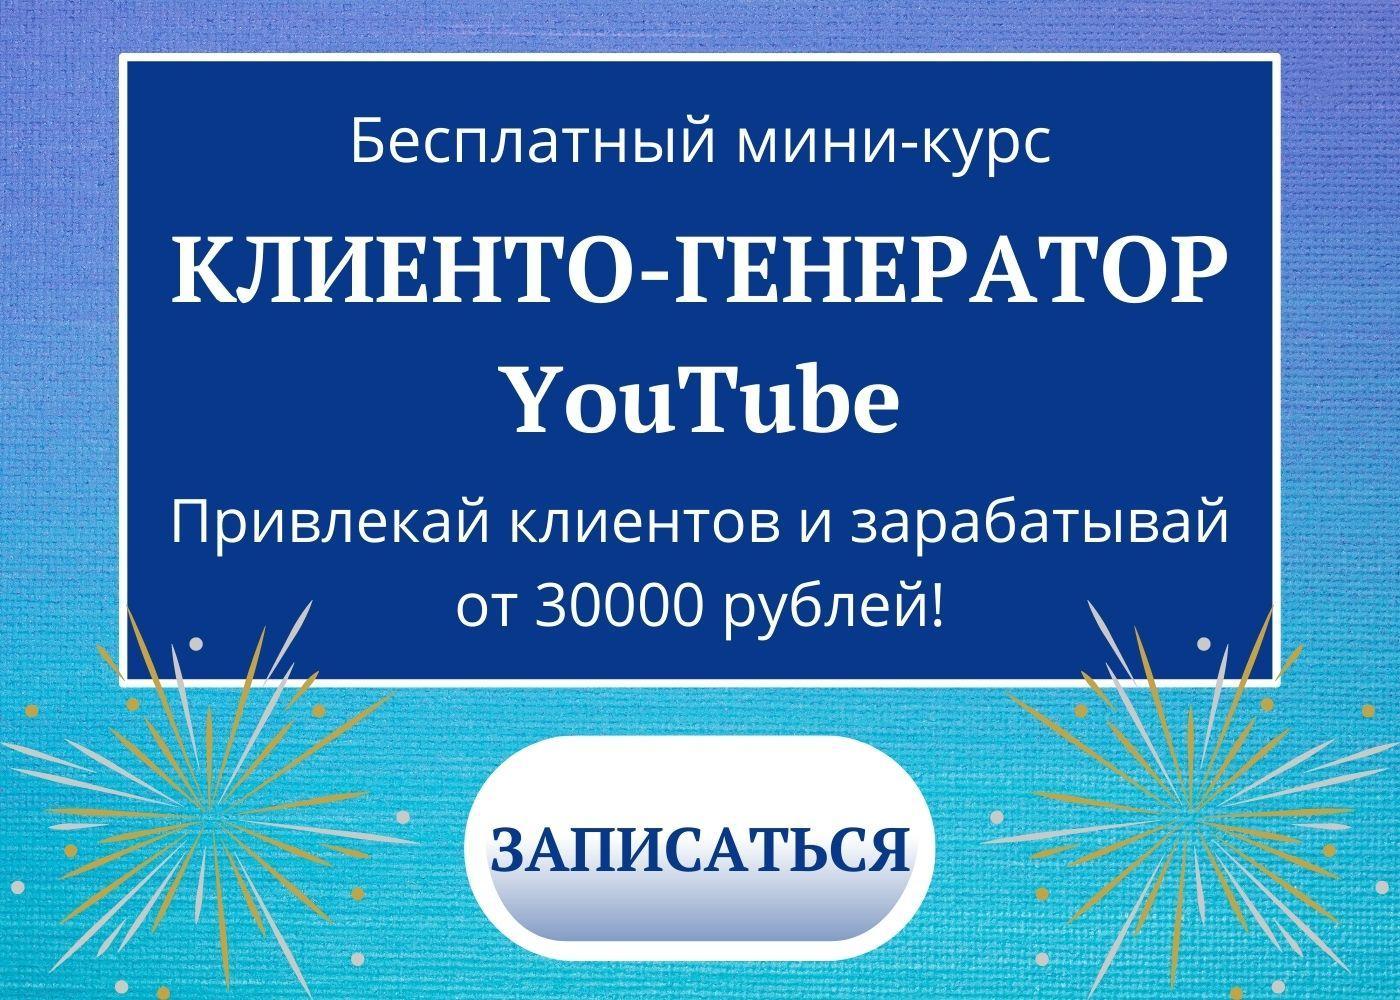 Клиентогенератор YouTube